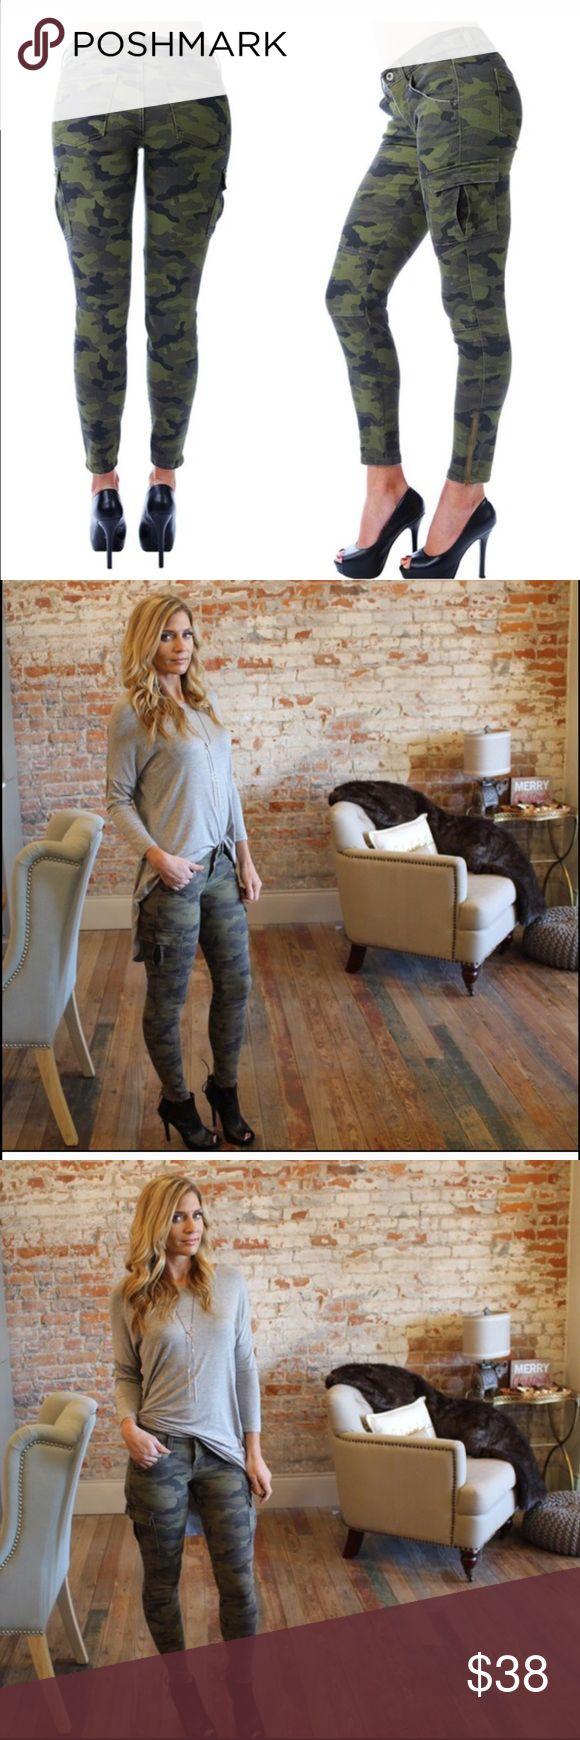 Camo skinny jeans Great quality Camo skinny jeans.         Reposhing from @scanon  sneek peek Jeans Skinny